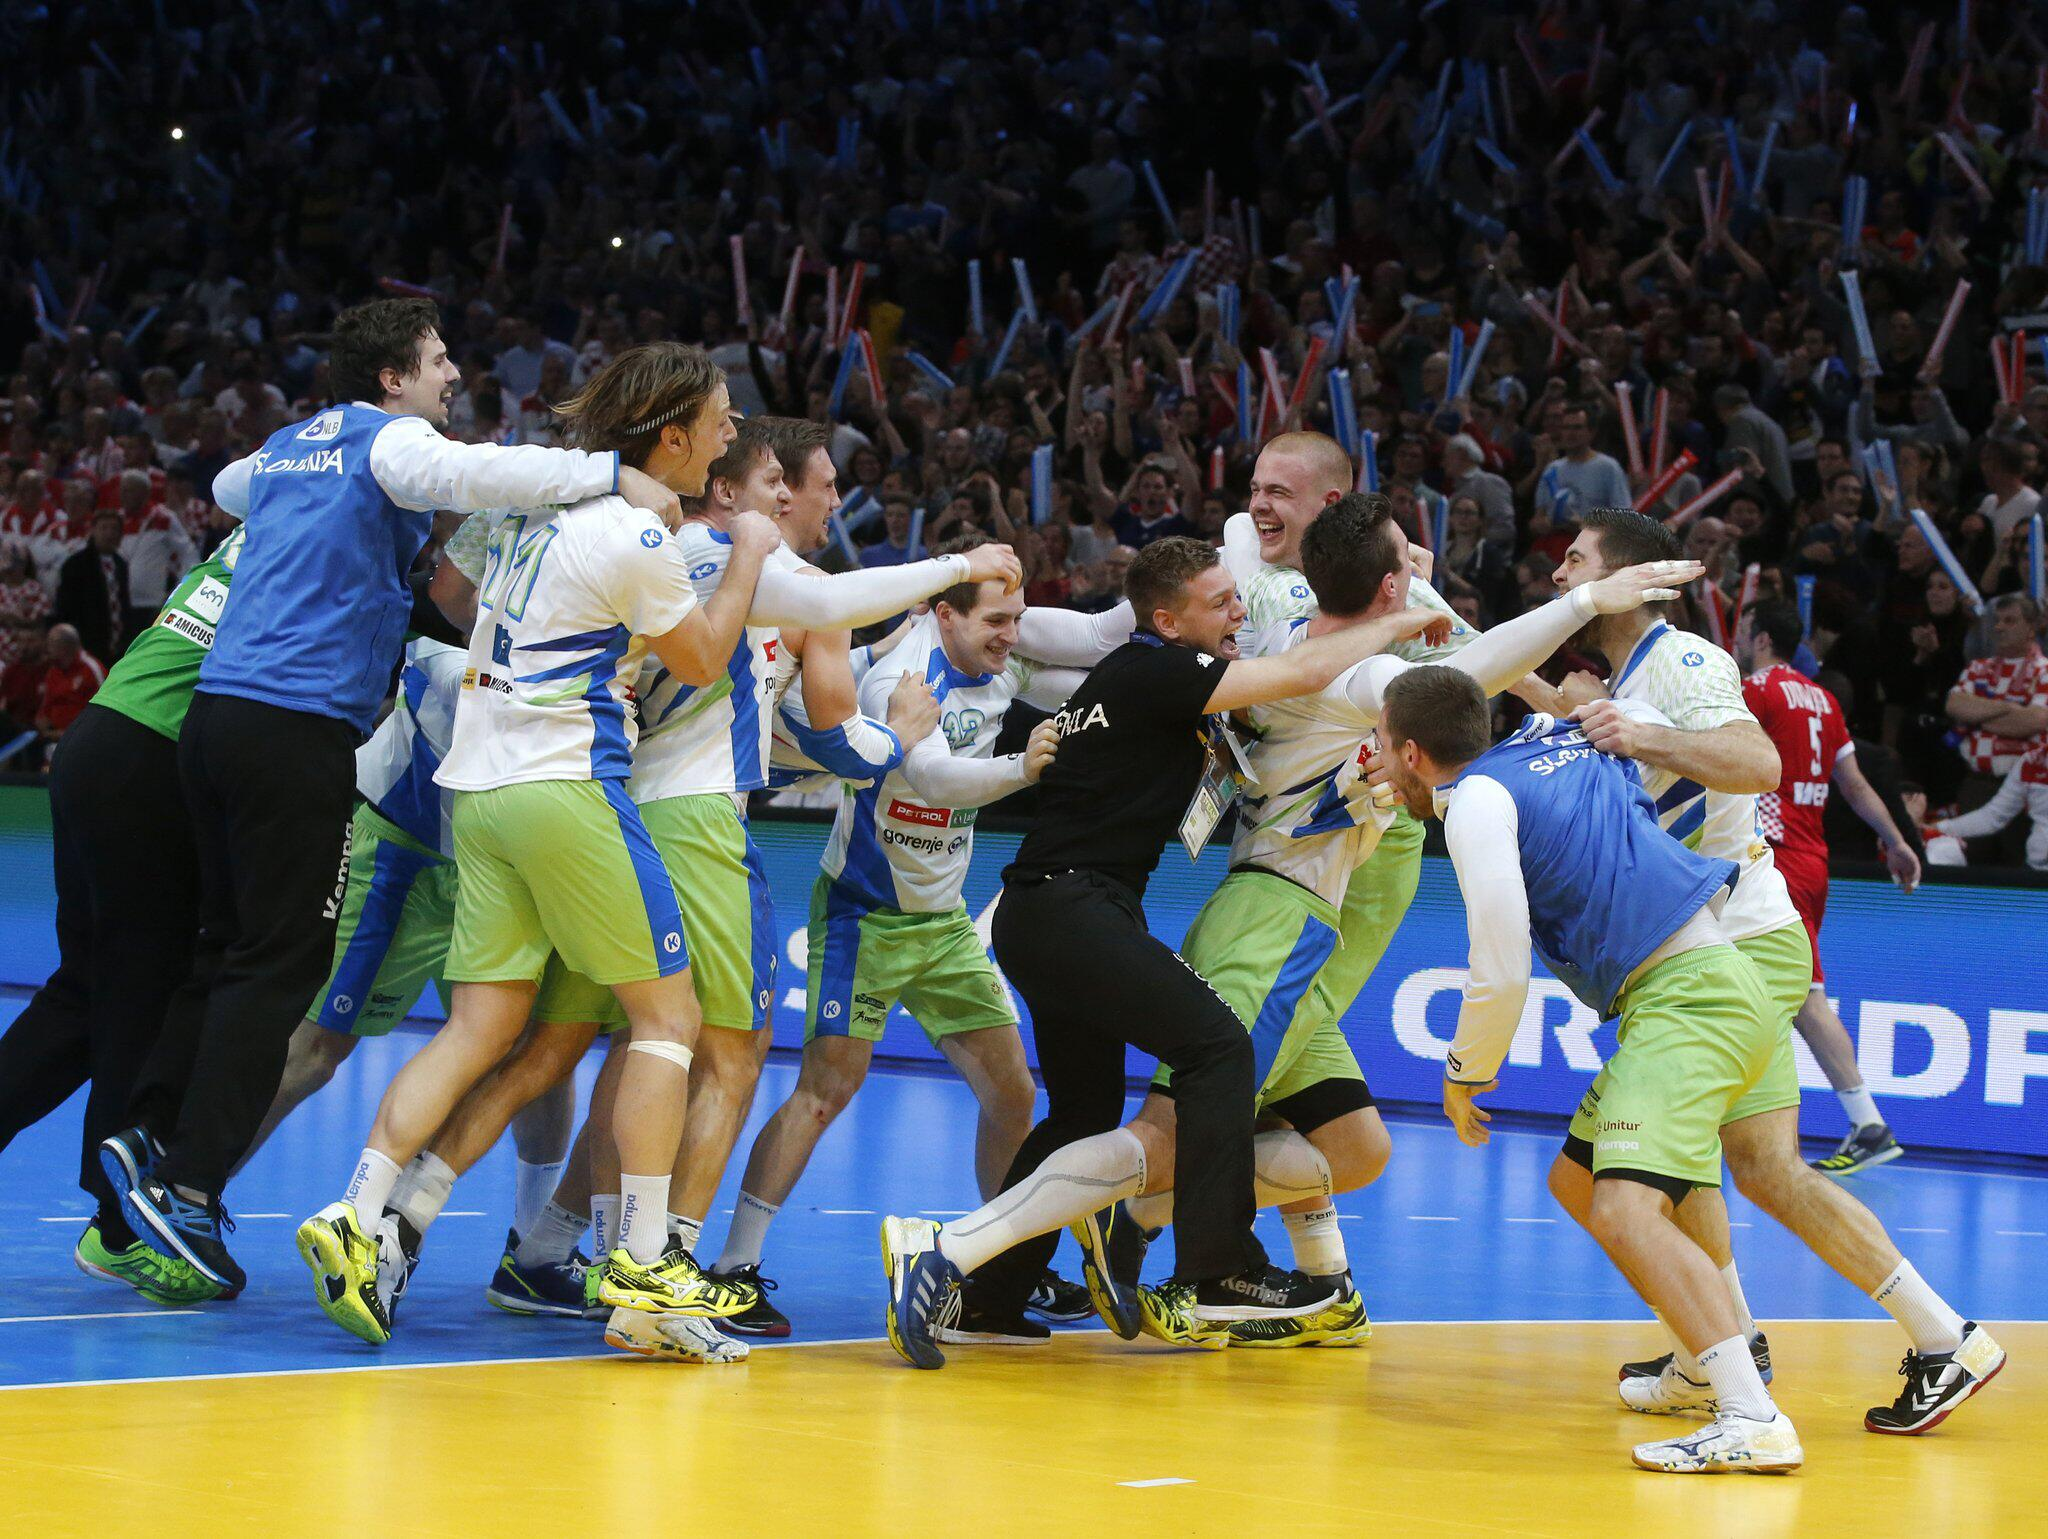 Bild zu Handball-WM - Slowenien - Kroatien, Bronze